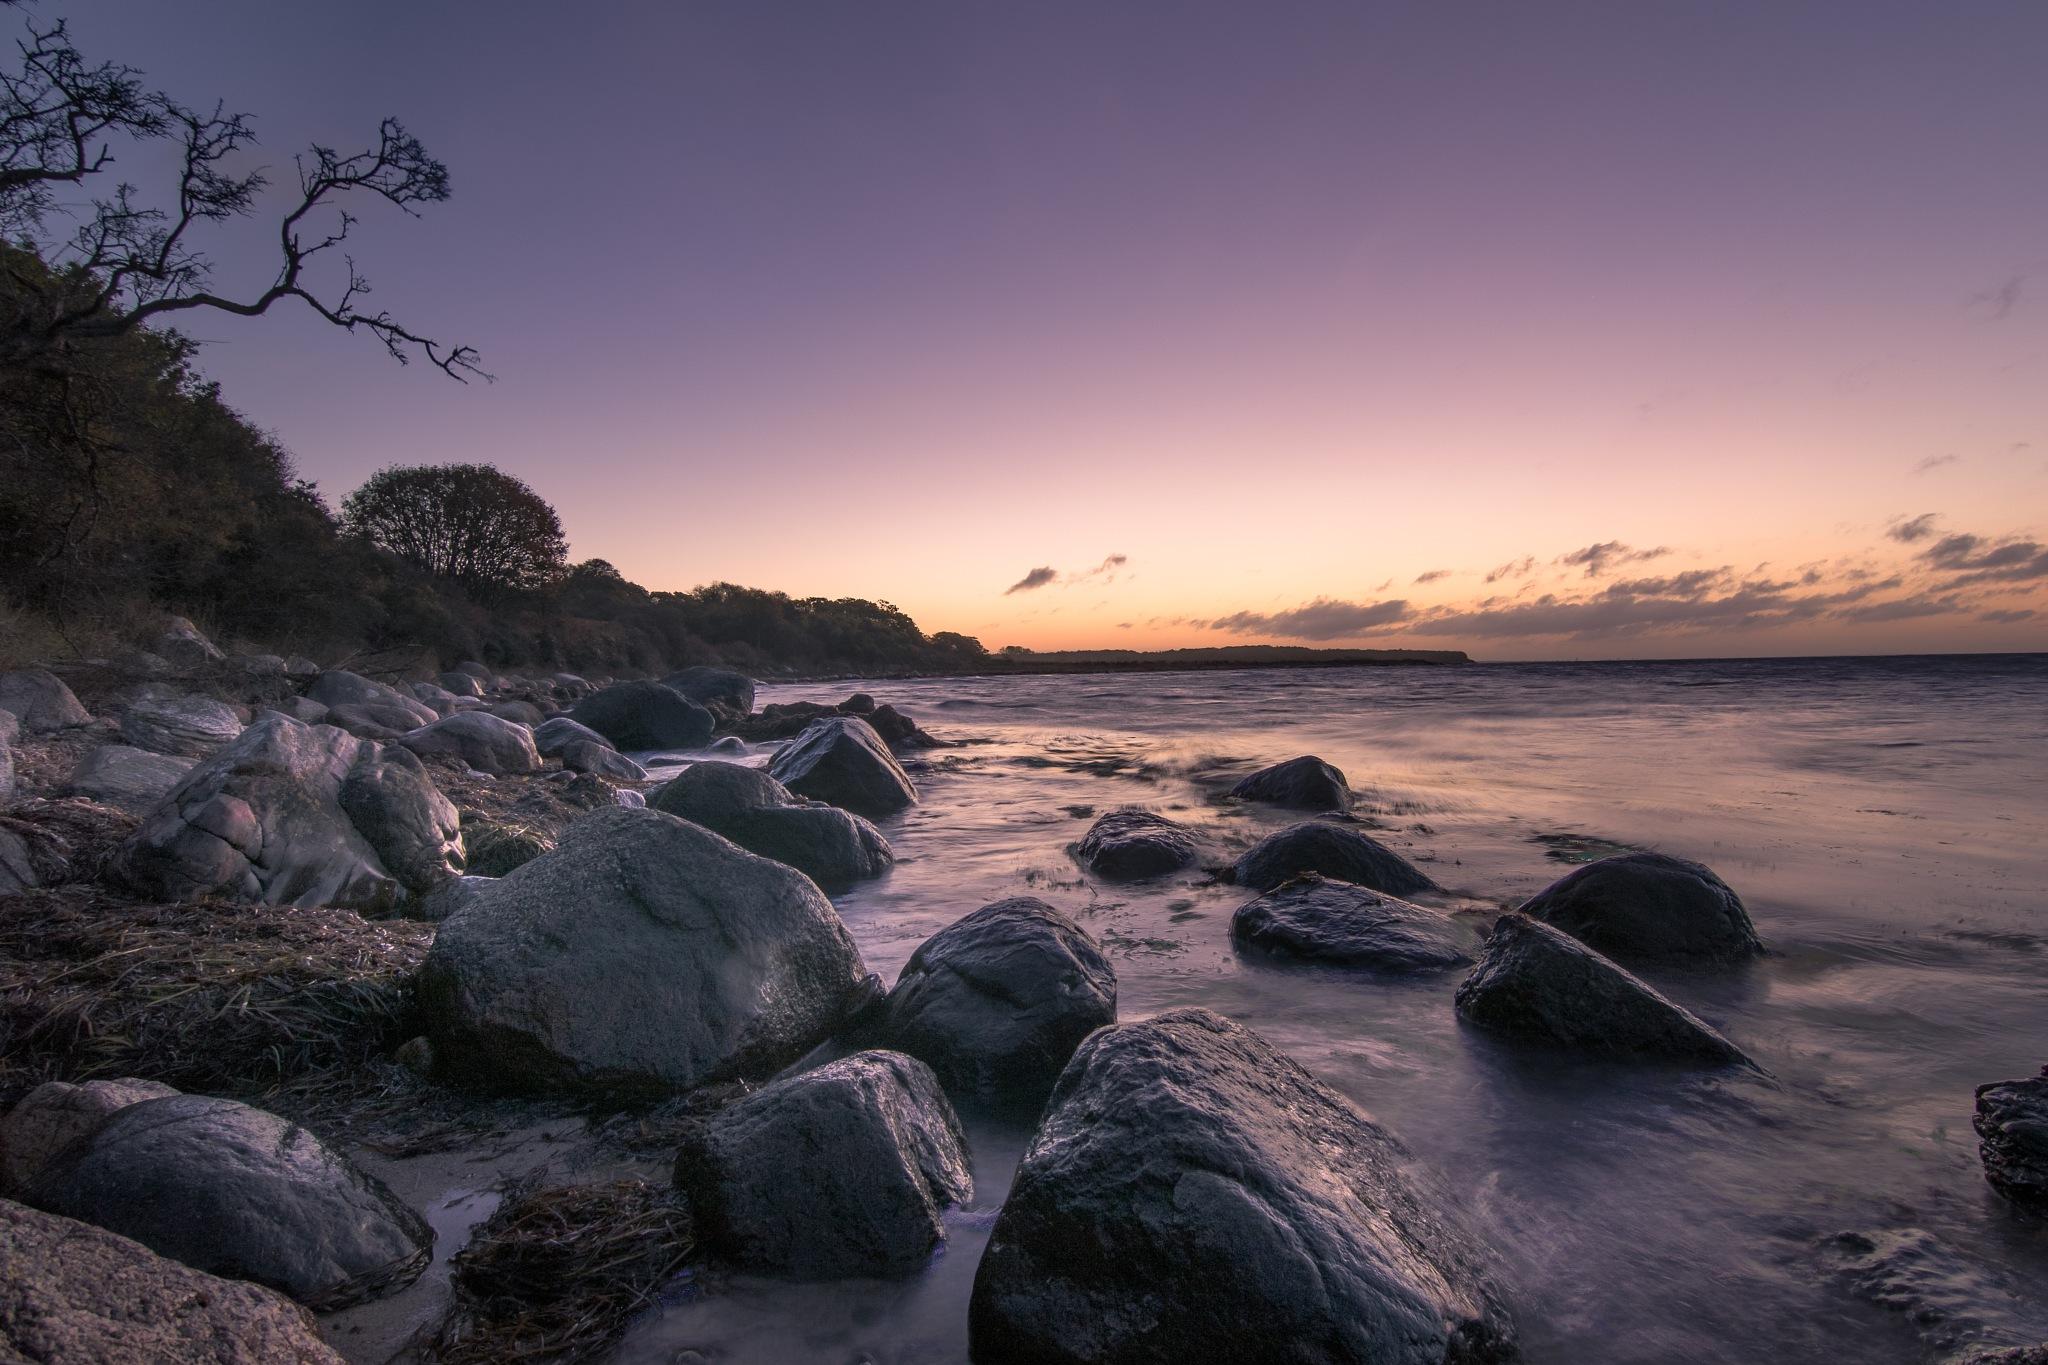 Along the coast by Michael B. Rasmussen